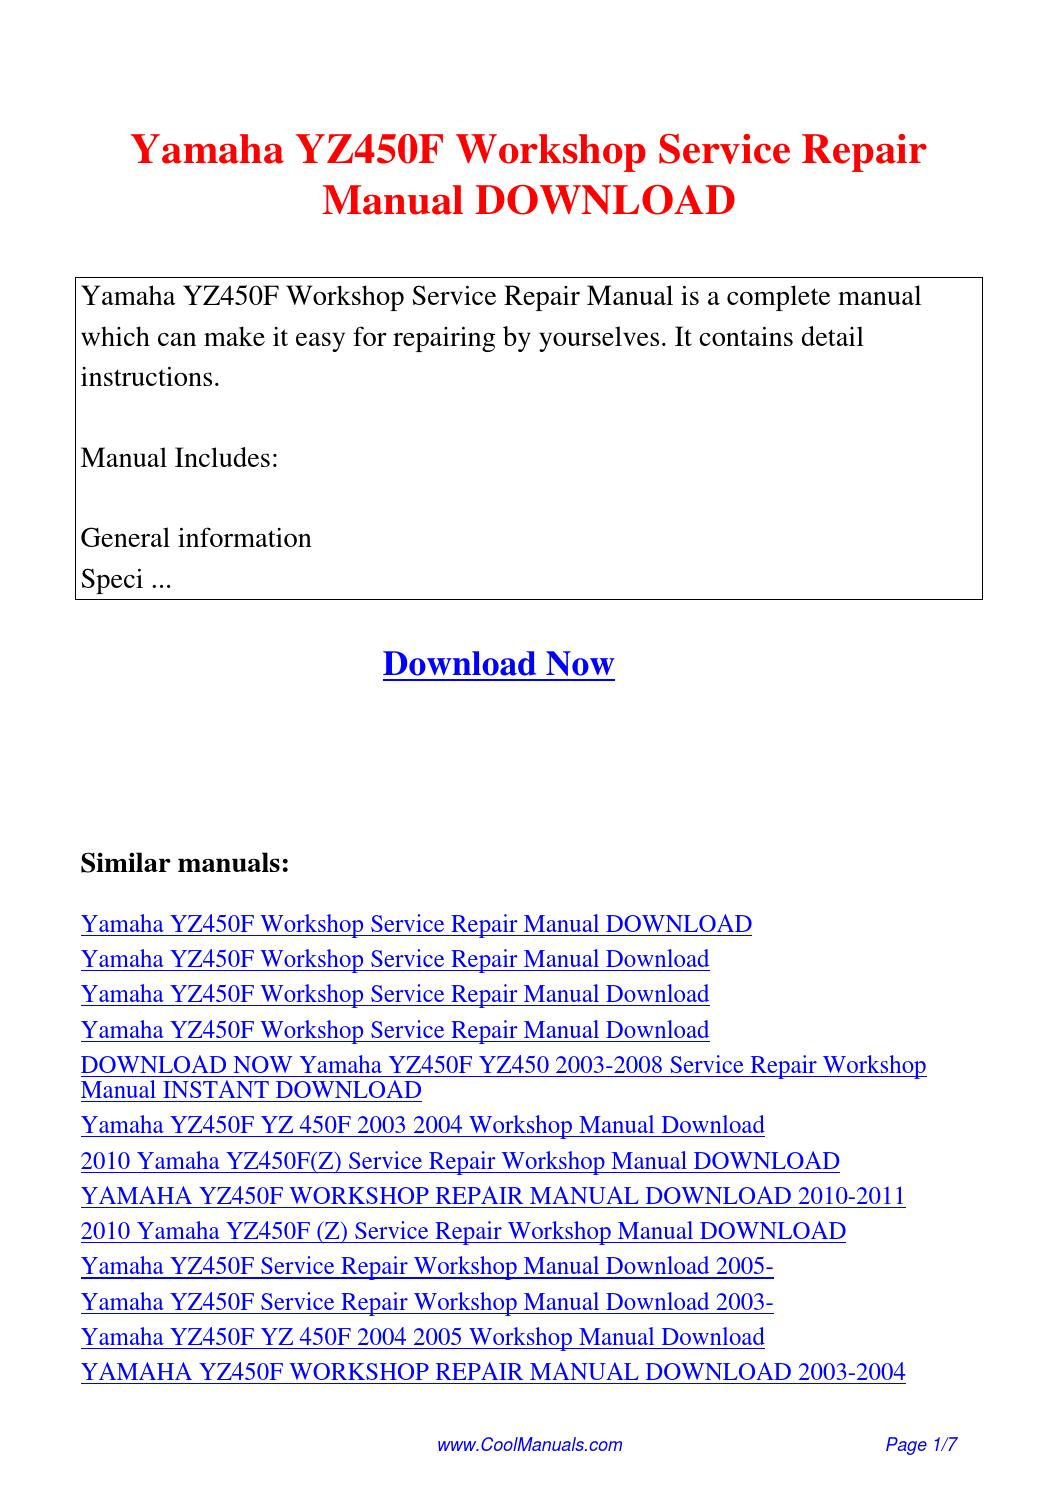 yamaha yz450f workshop service repair manual pdf by guang hui issuu rh issuu com 2004 yamaha yz450f service manual pdf 2004 Honda CRF450R